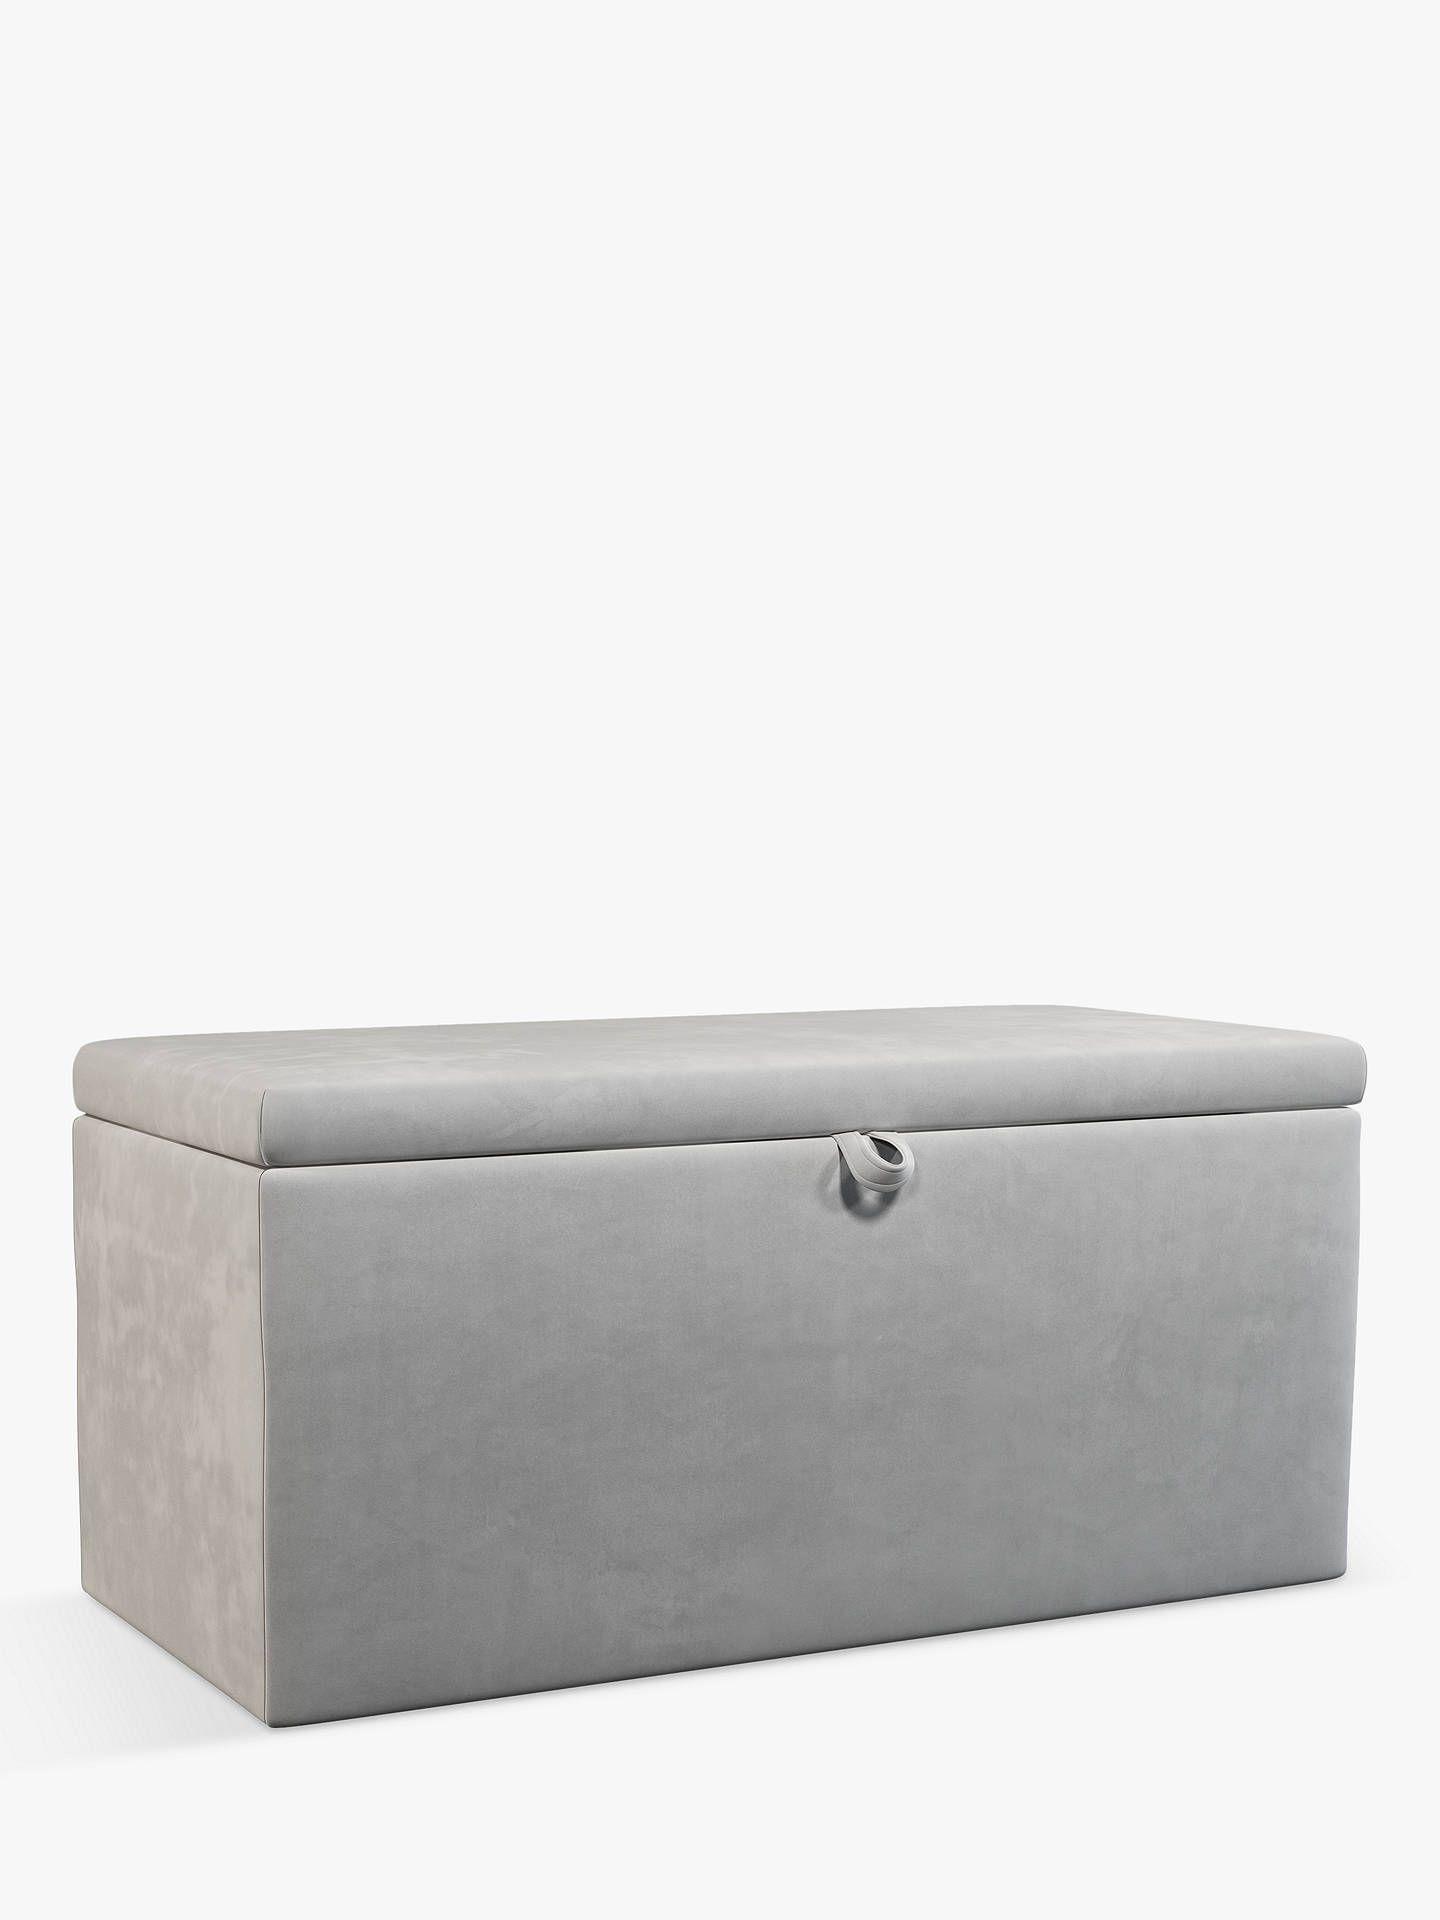 Fine John Lewis Partners Emily Upholstered Ottoman Storage Box Dailytribune Chair Design For Home Dailytribuneorg